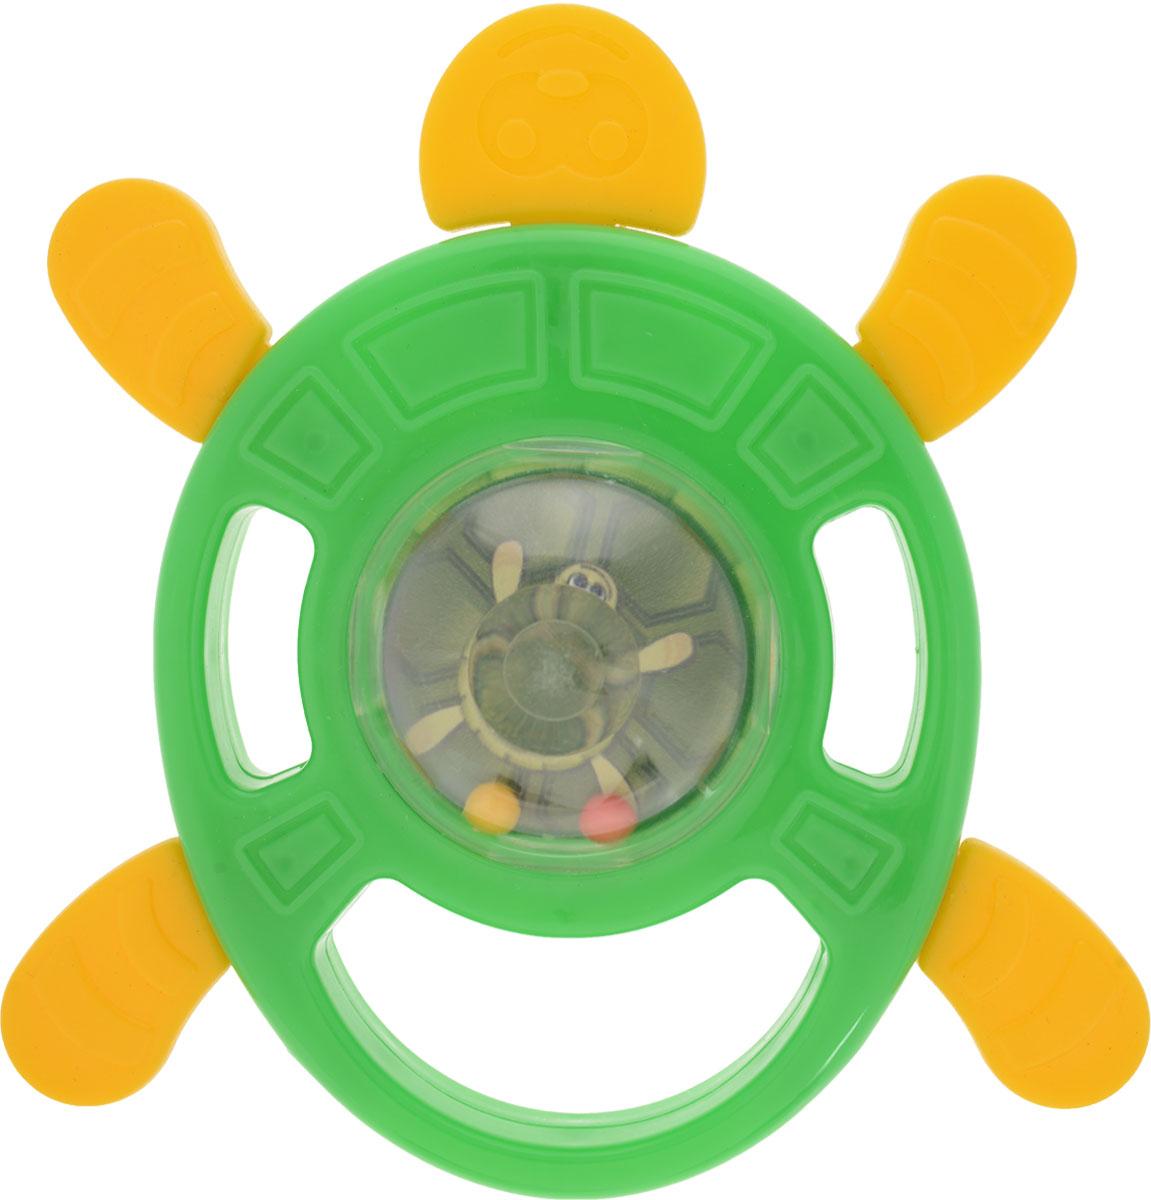 Zakazat.ru Пластмастер Погремушка-грызунок Черепаха цвет зеленый